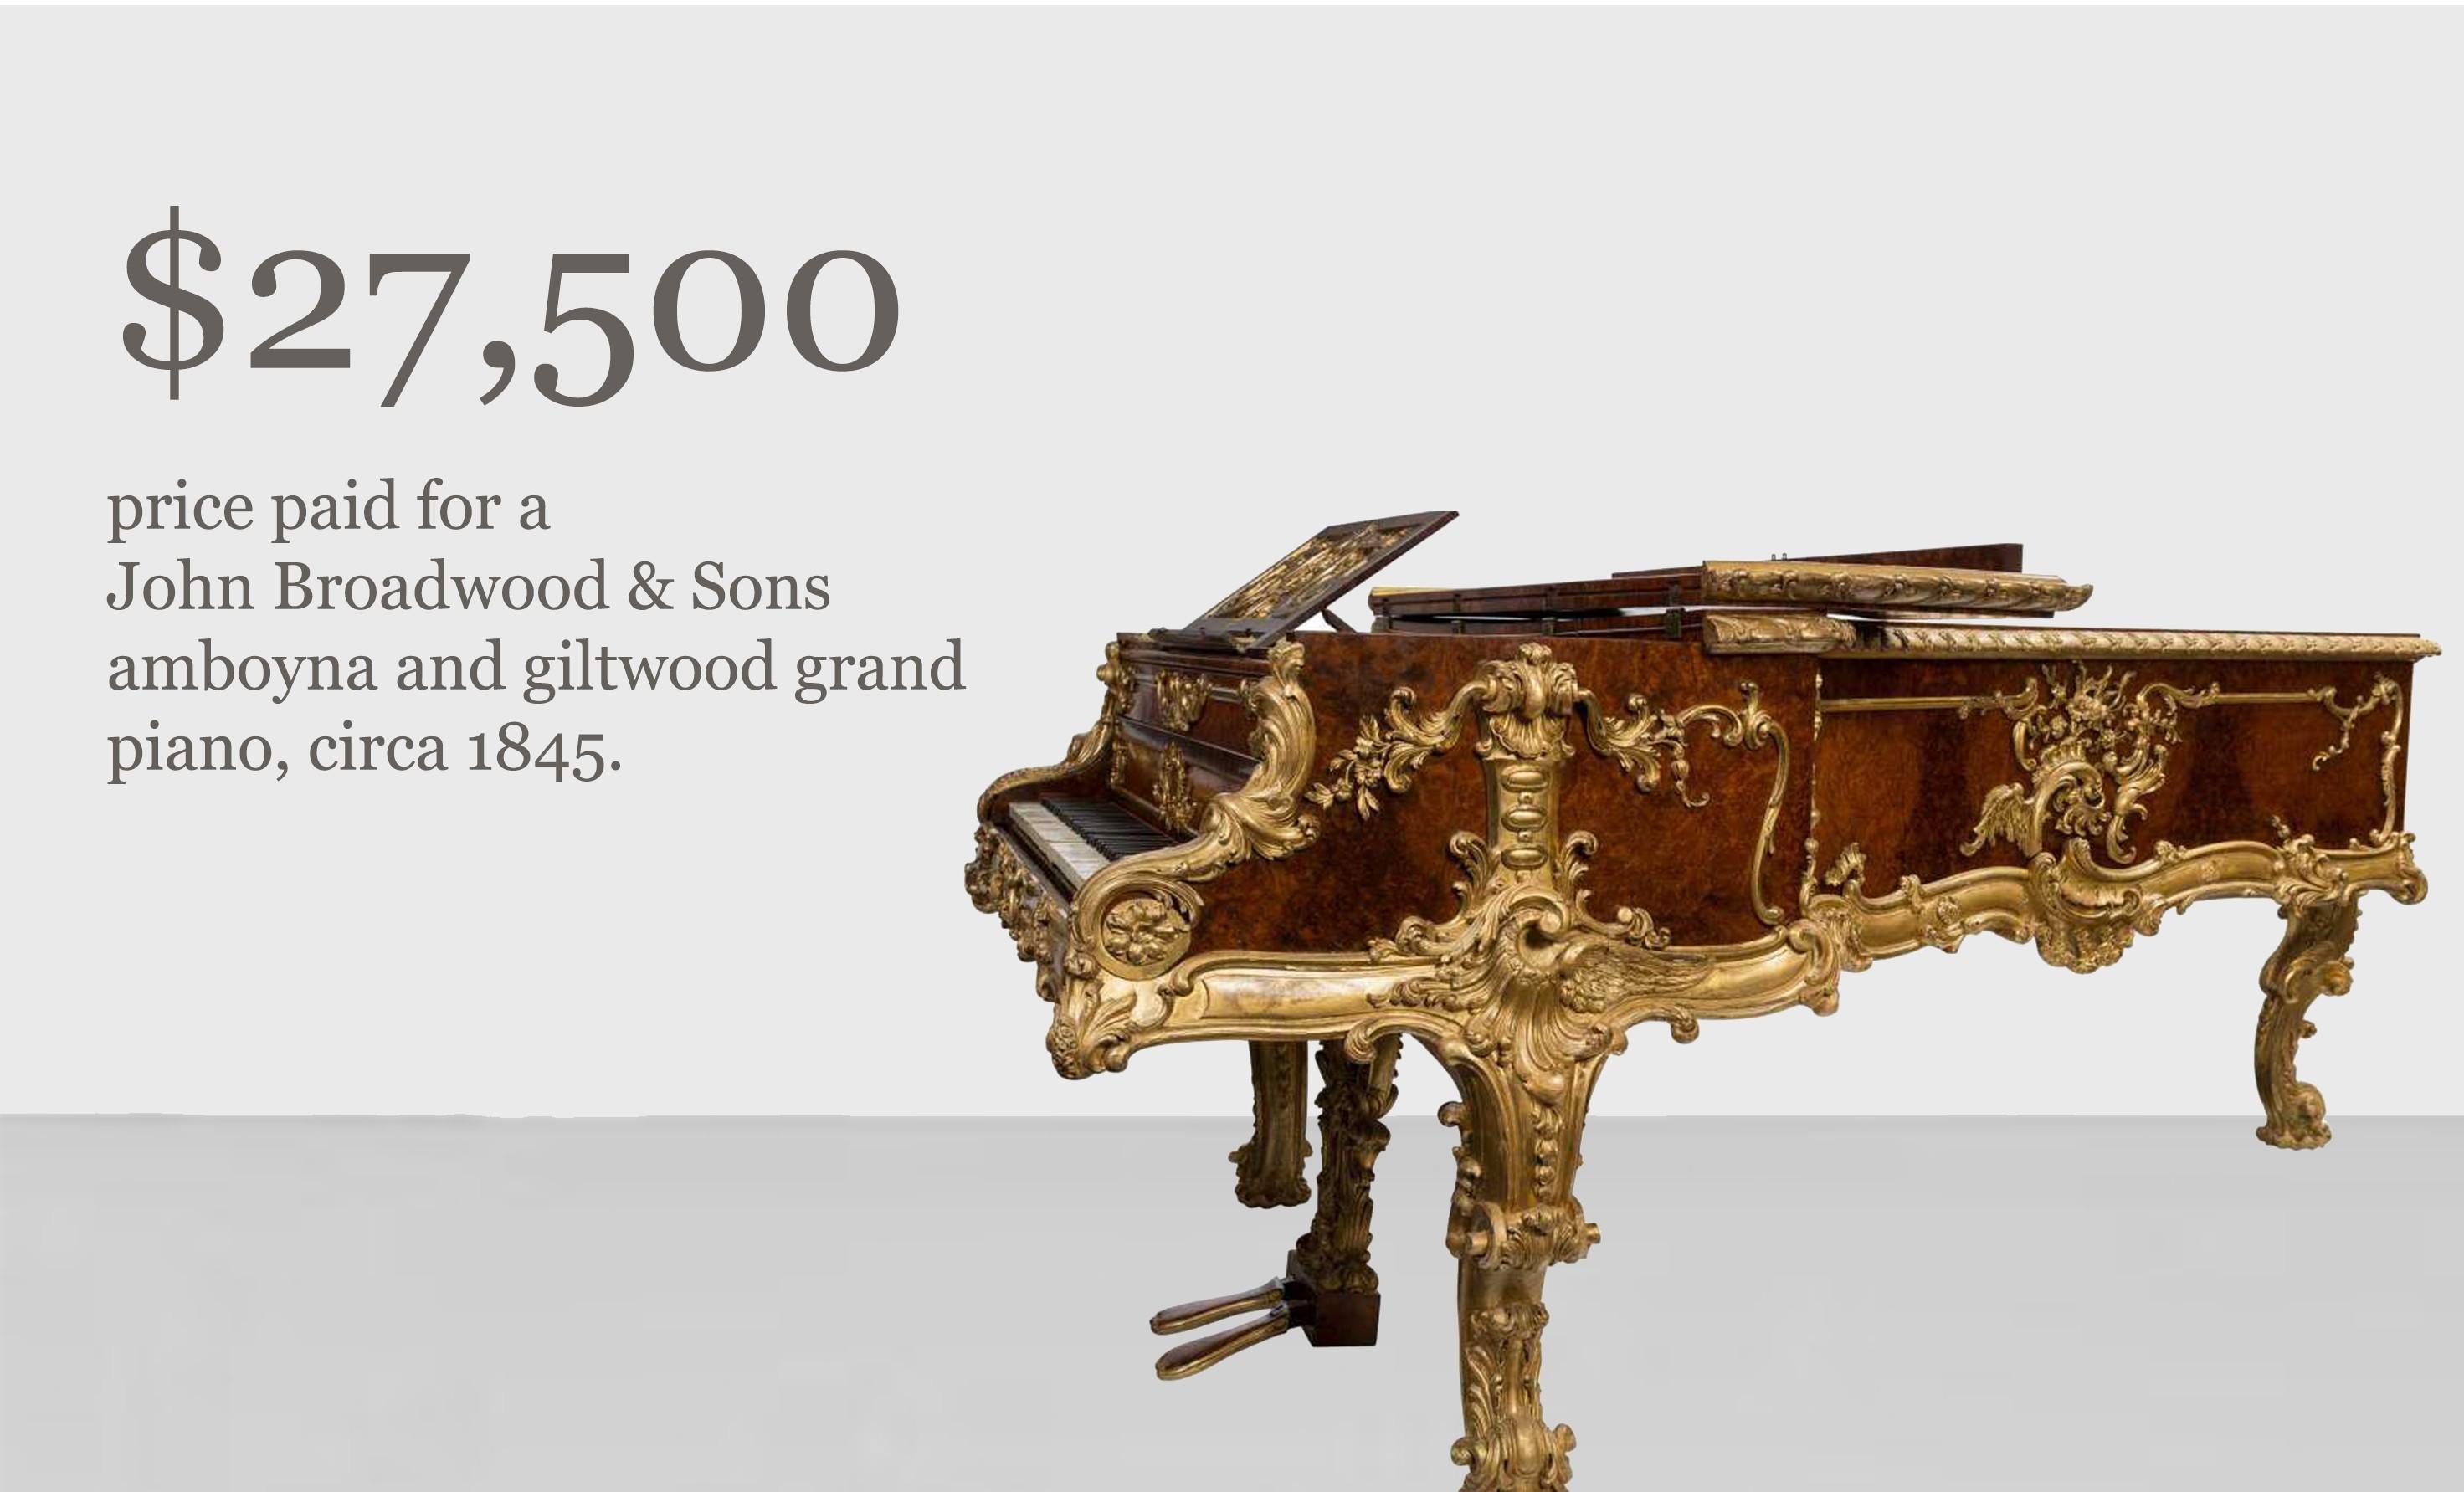 John Broadwood & Sons amboyna and giltwood grand piano